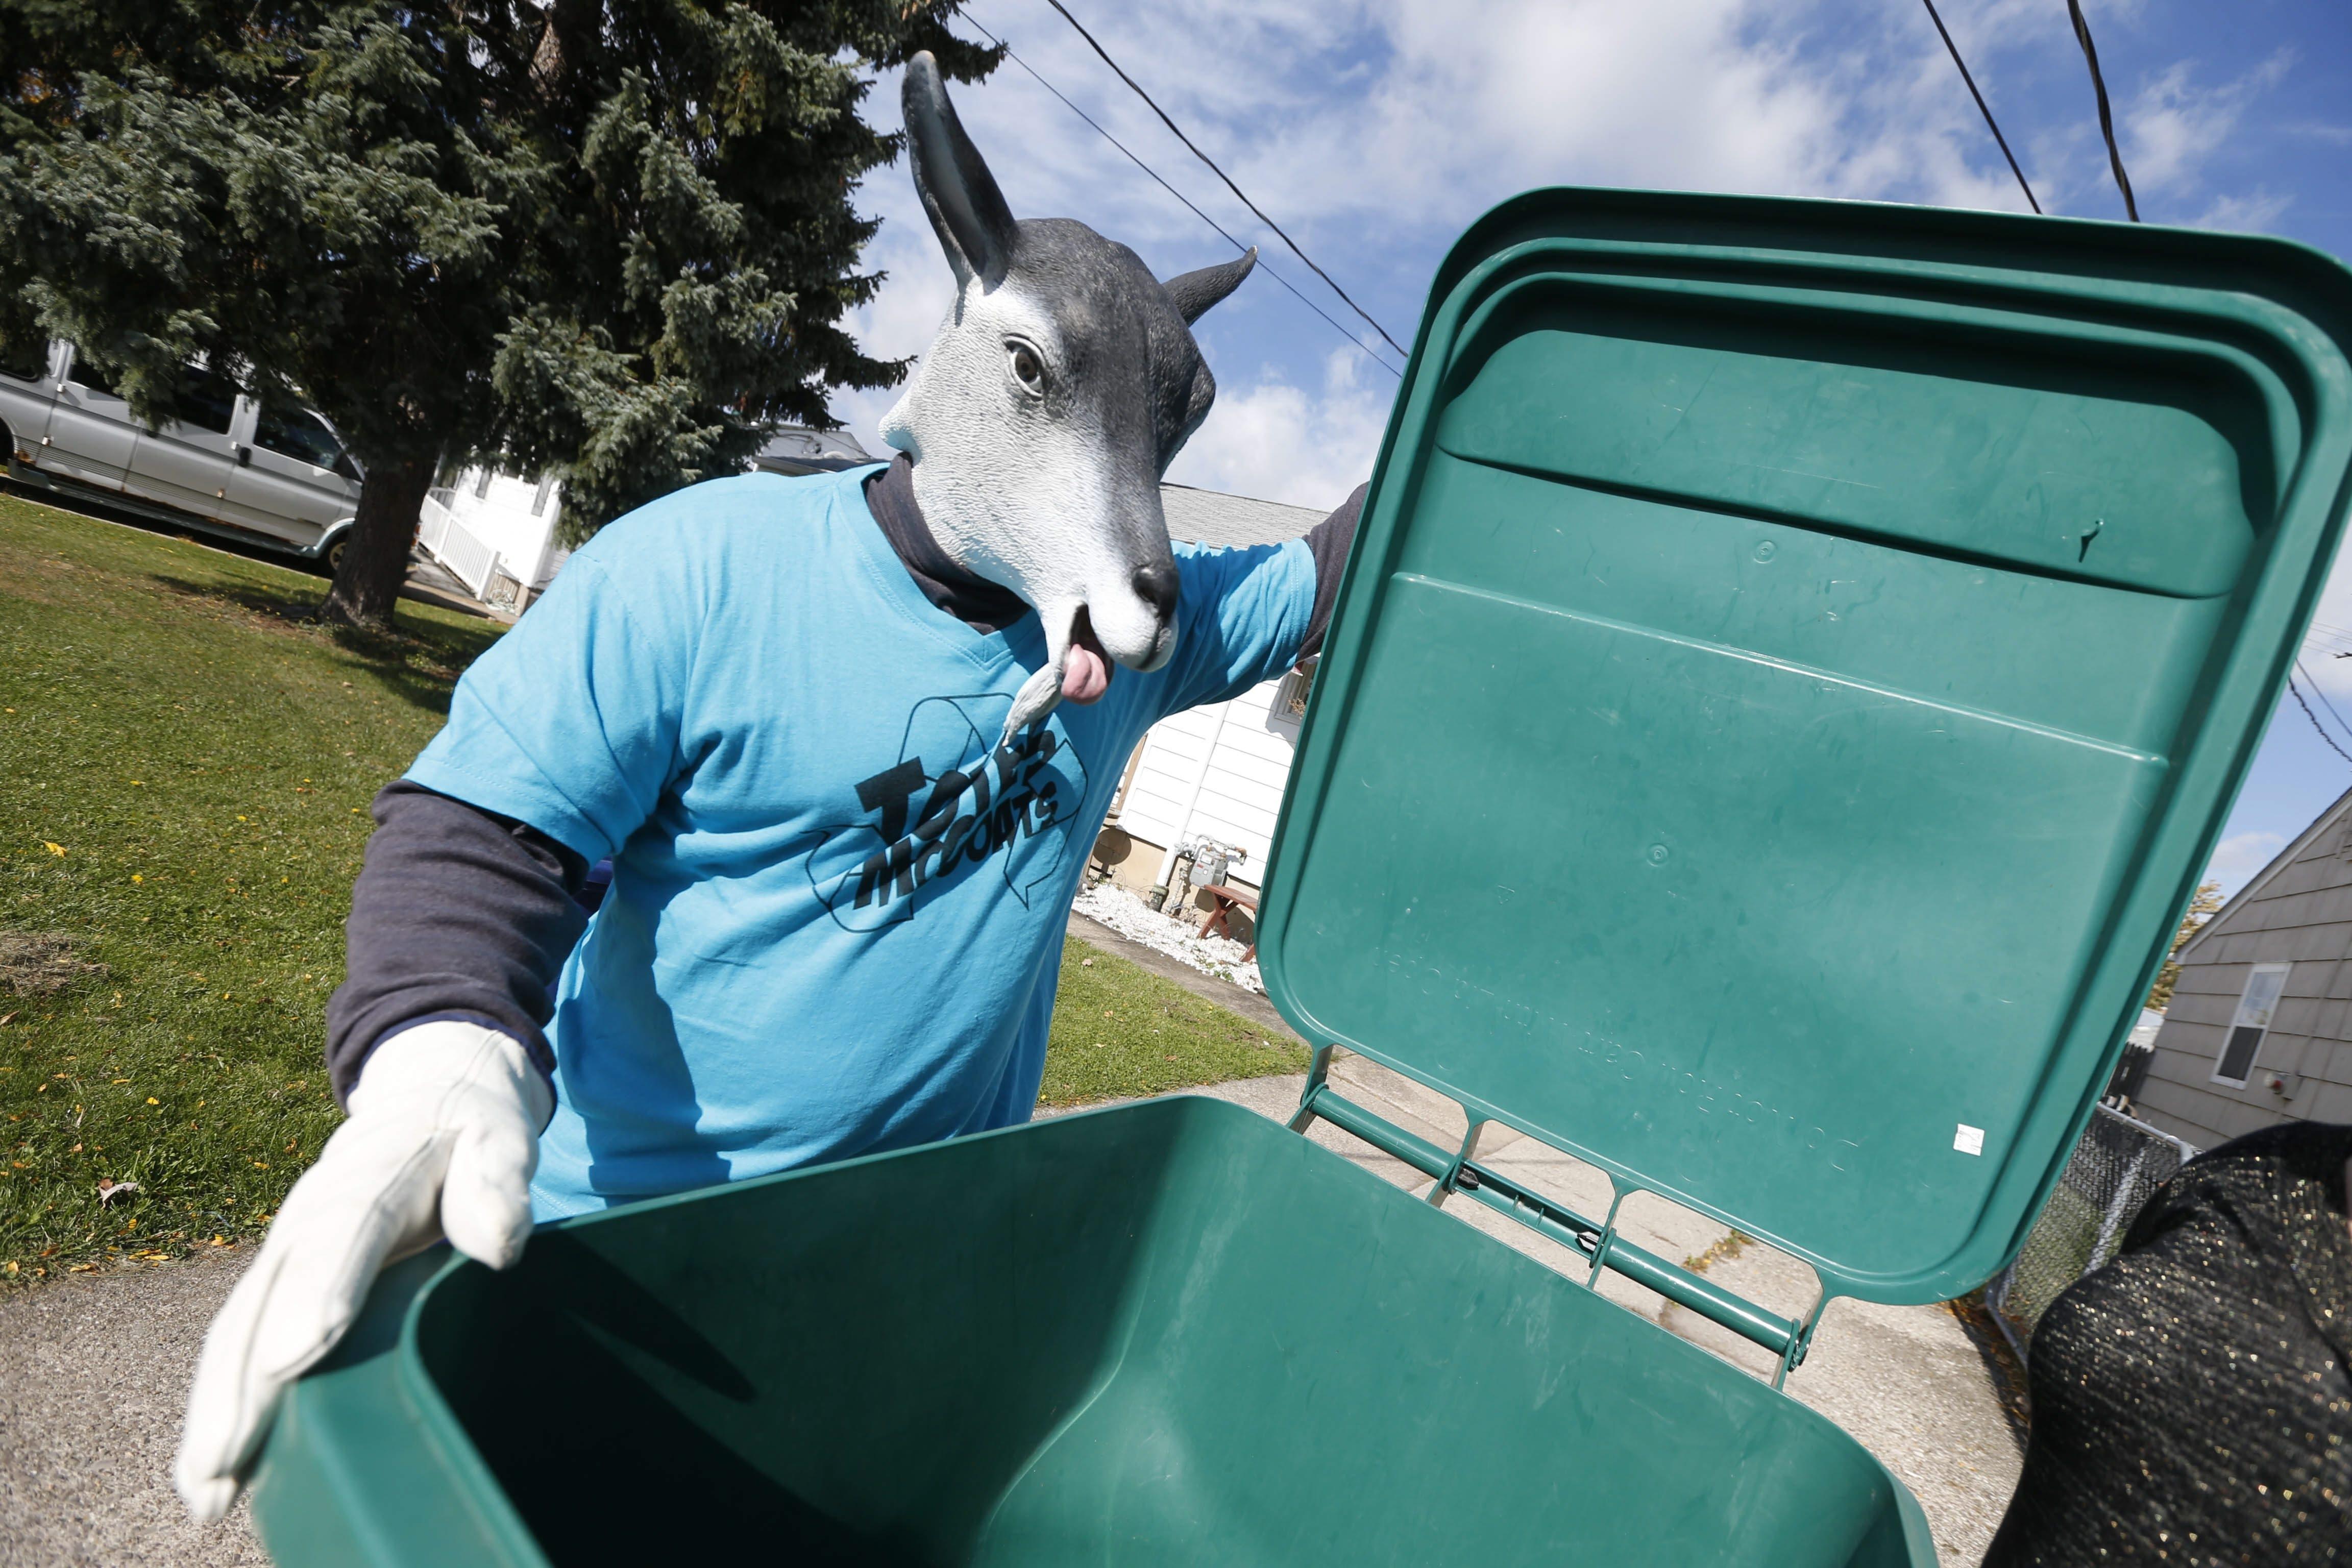 Totes McGoats made an appearance at a park on Jerauld St. in Niagara Falls, NY onThursday, Oct. 15, 2015.  (Robert Kirkham/Buffalo News)